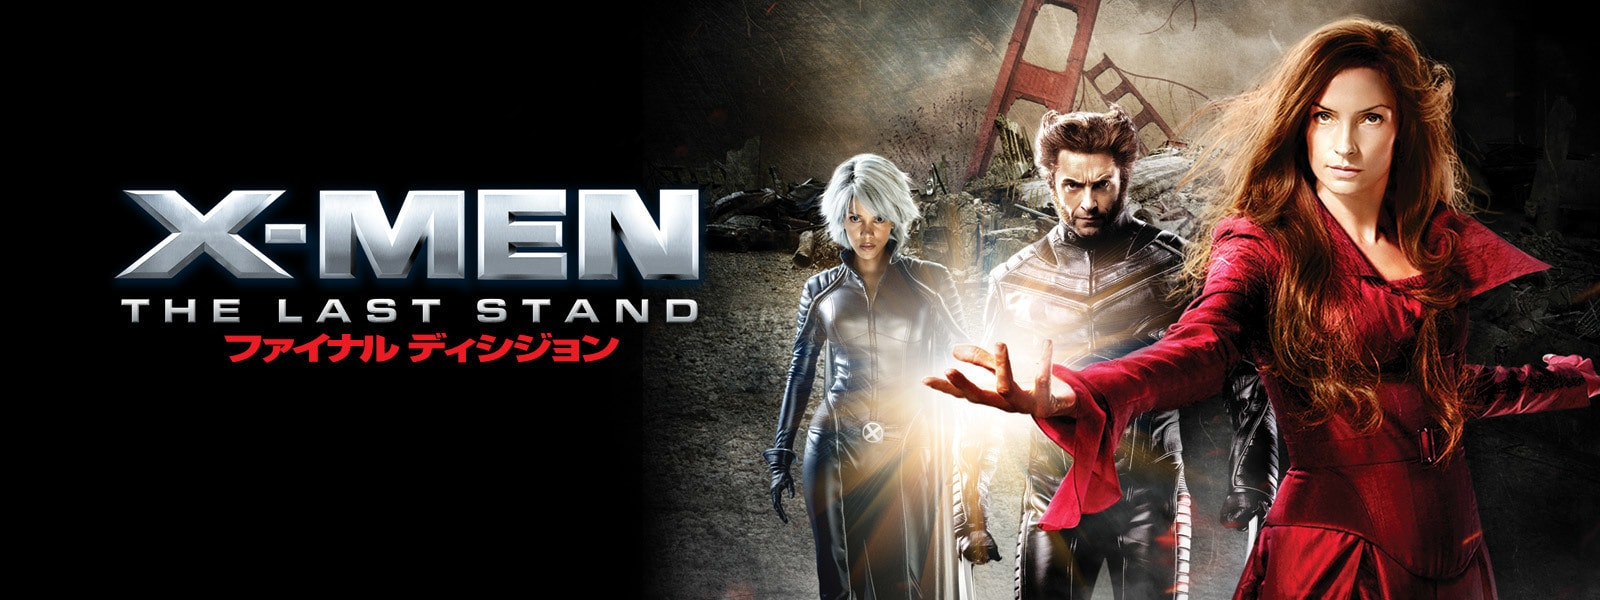 X-MEN:ファイナル ディシジョン X-Men: The Last Stand Hero